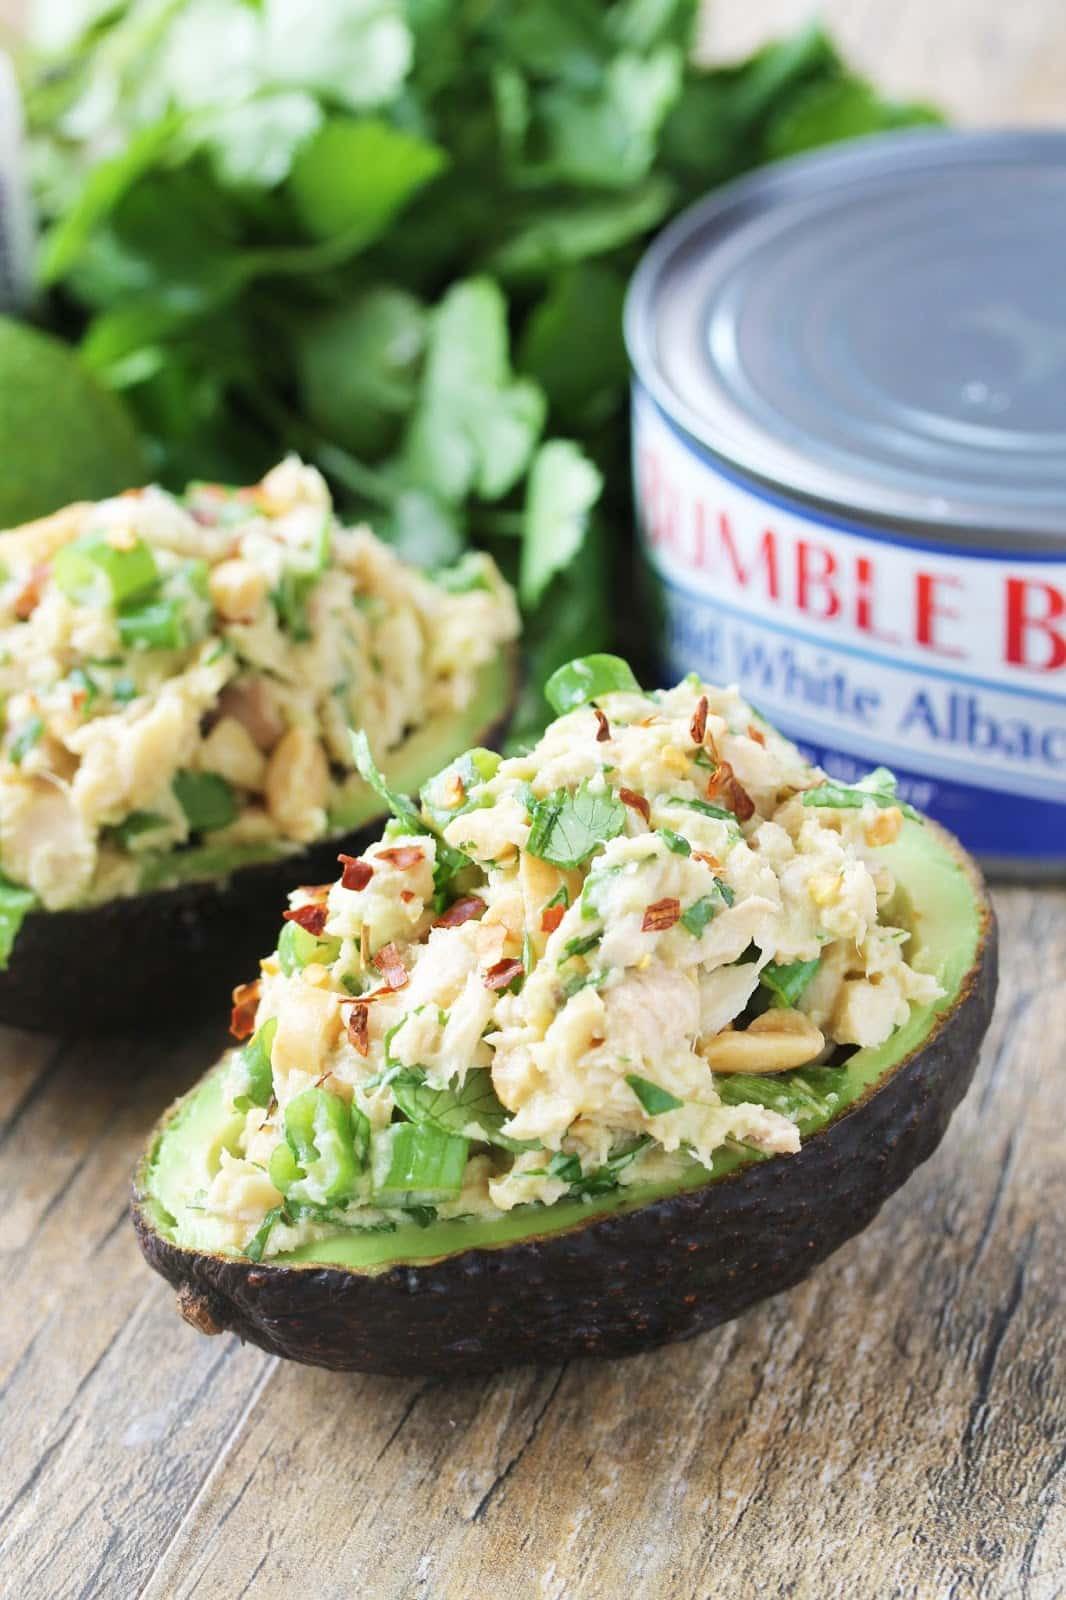 Avocado Recipes Healthy  Healthy Thai Tuna Stuffed Avocado